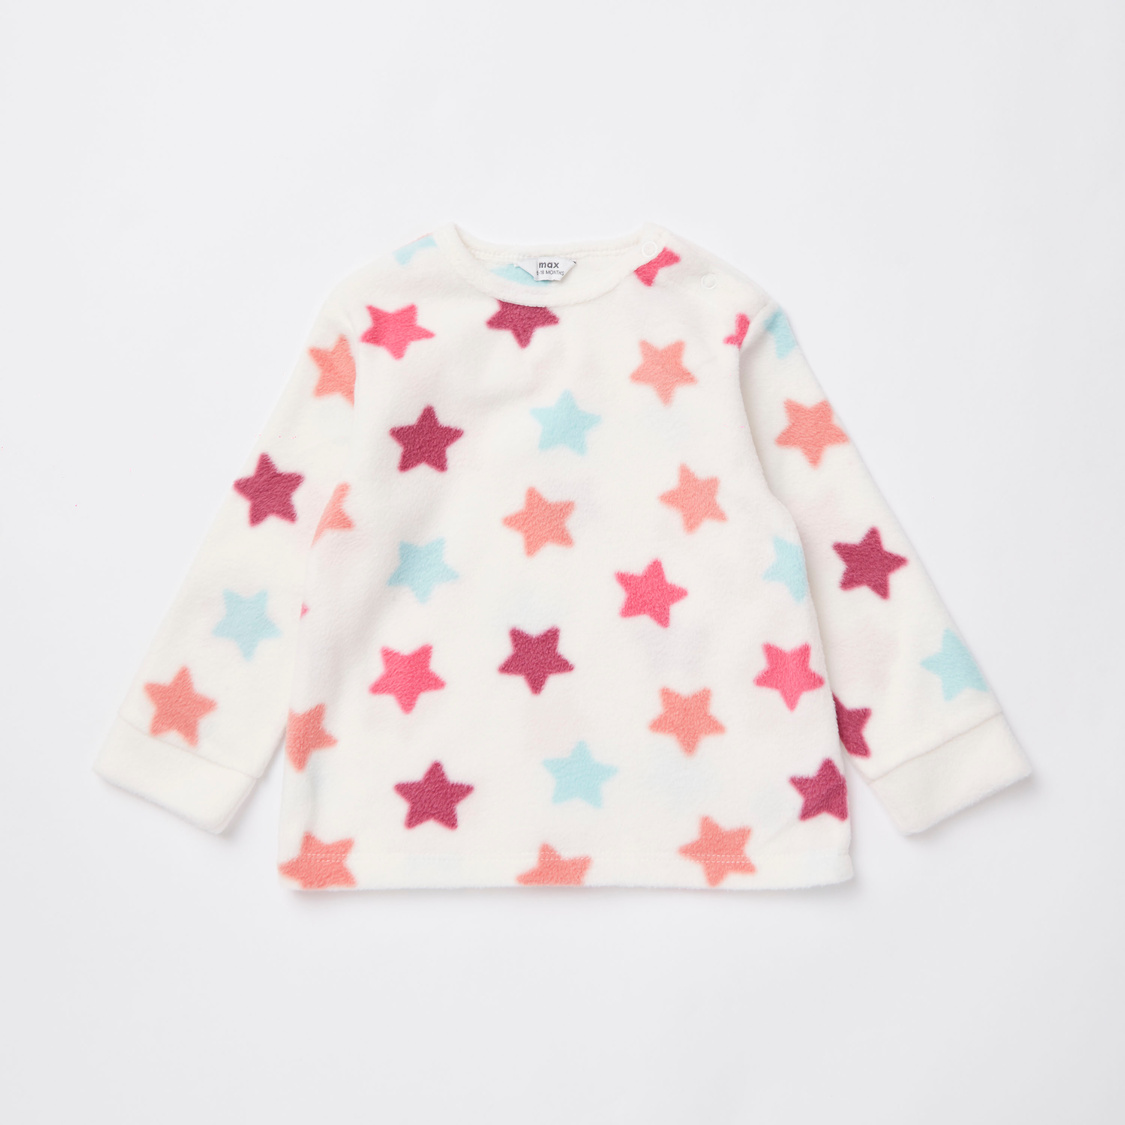 Star Print Long Sleeves Top and Full Length Pyjama Set